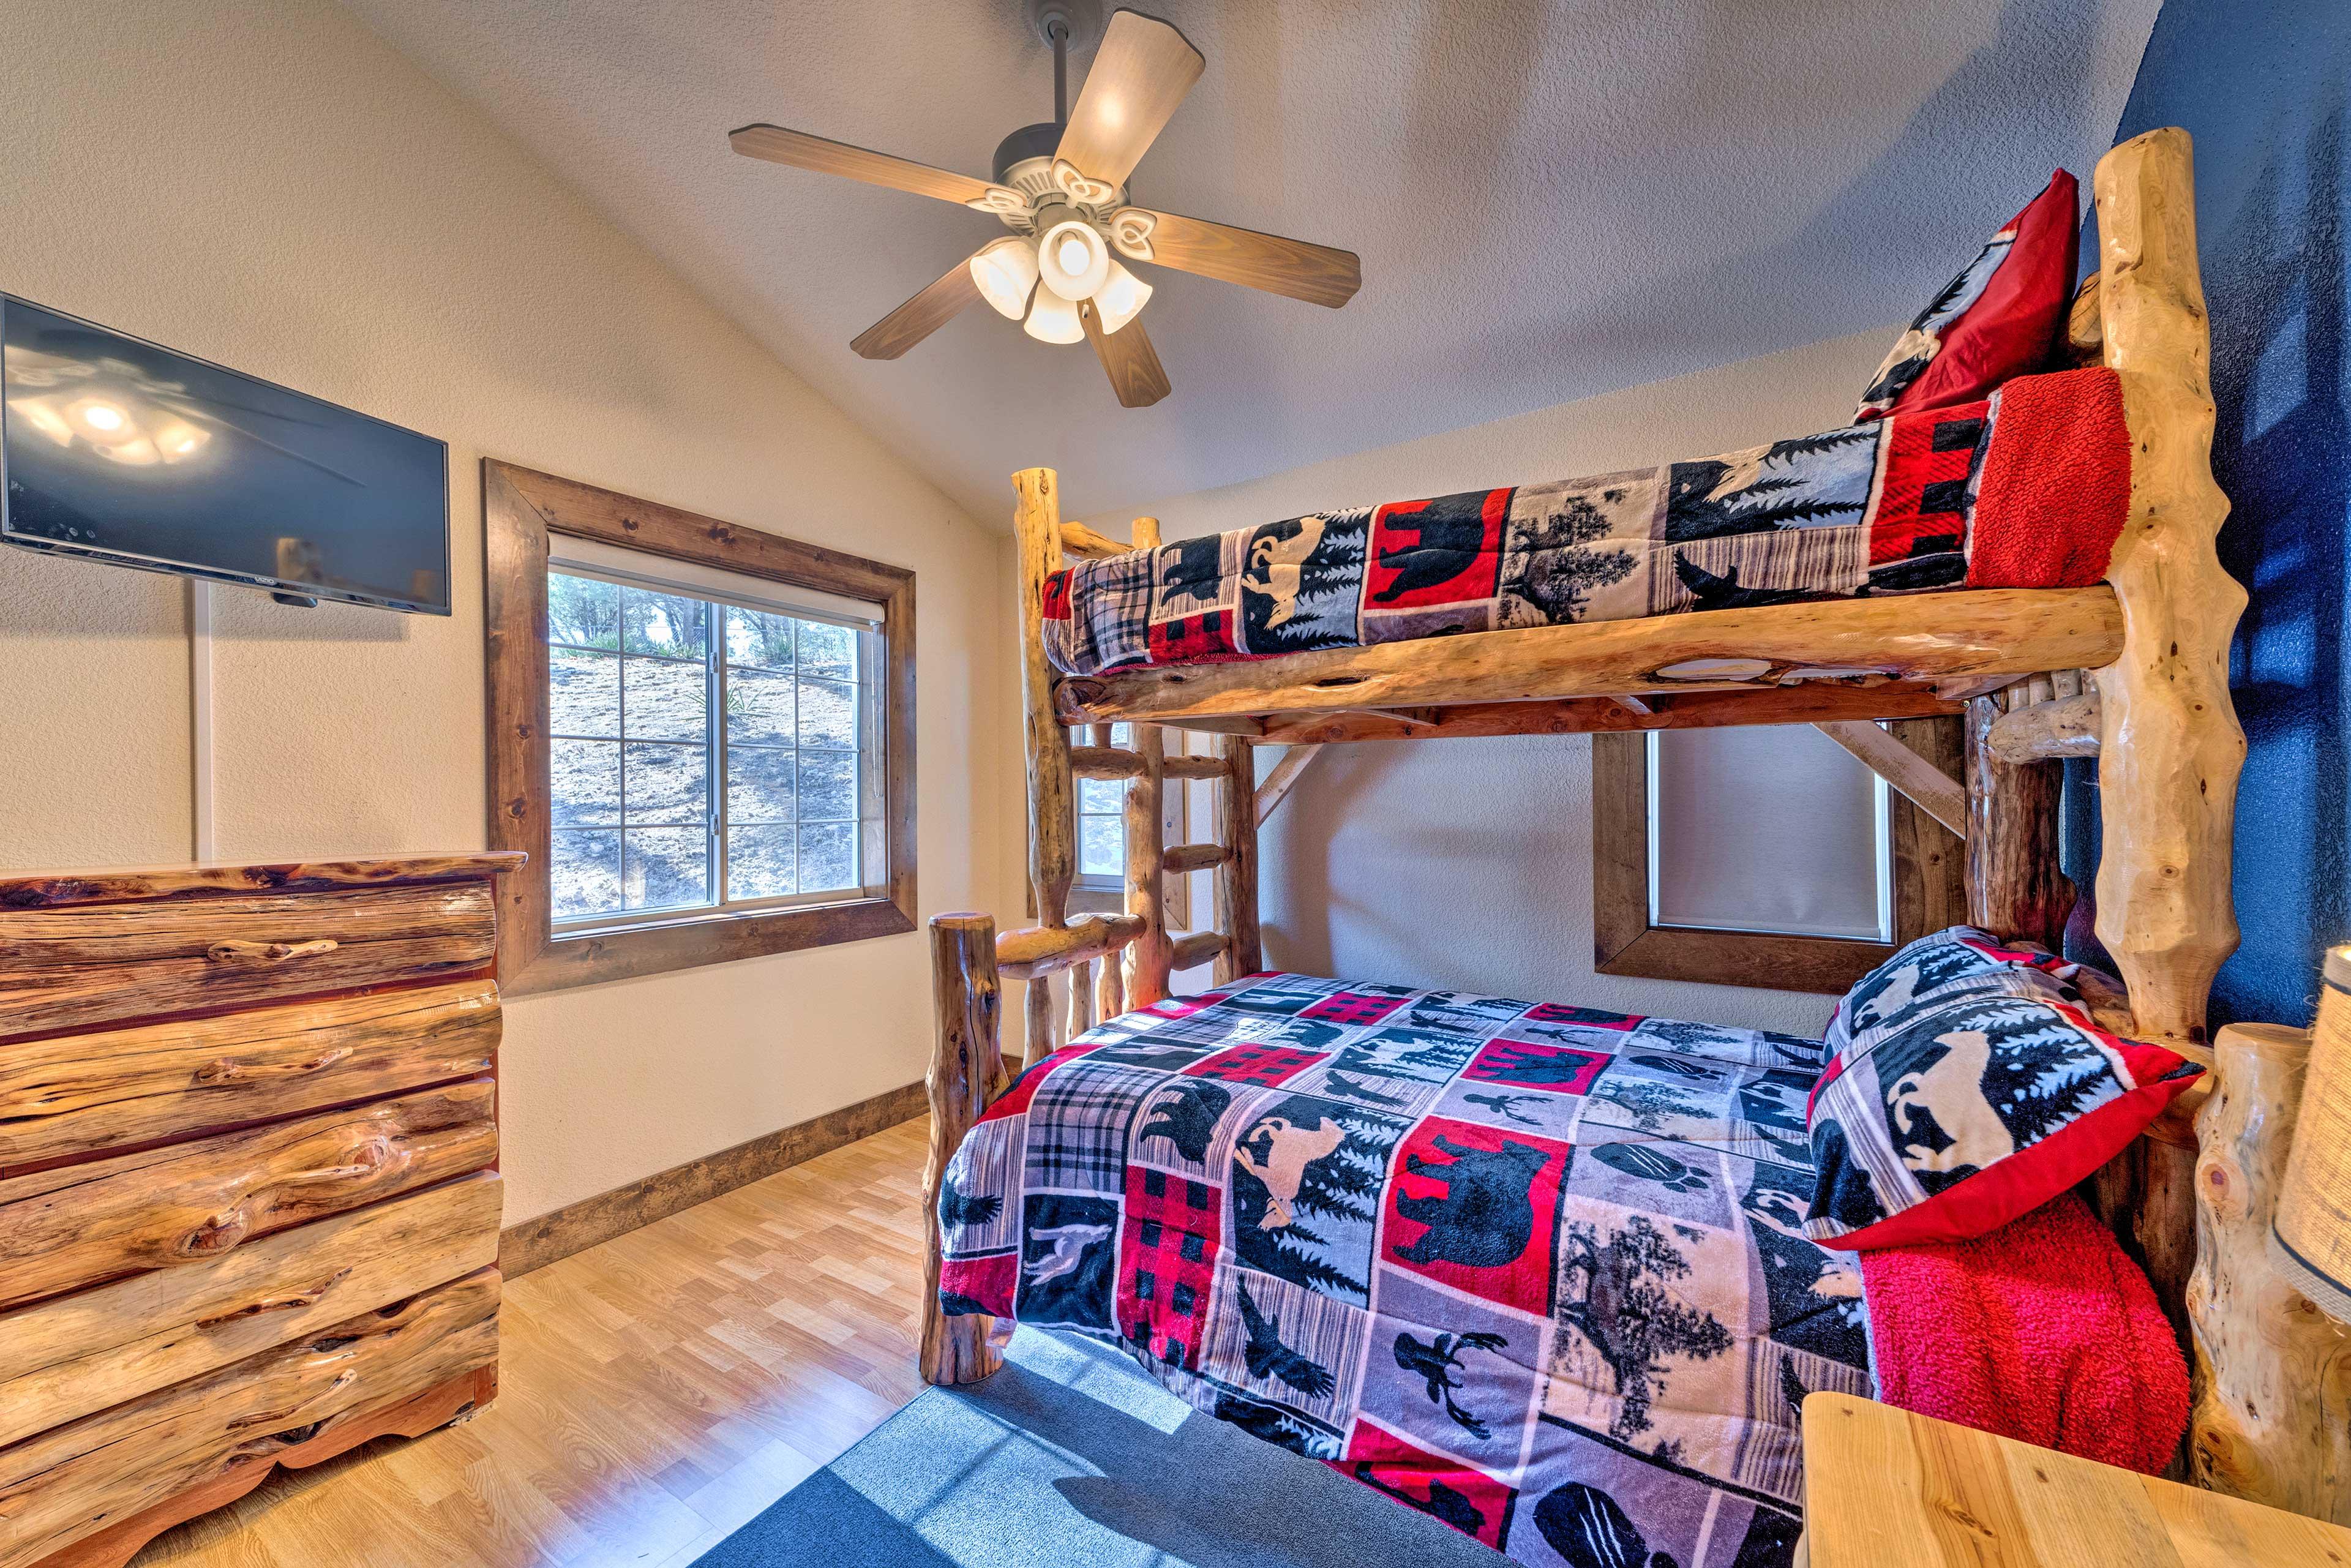 Bedroom 3 boasts a twin-over-queen bunk bed.